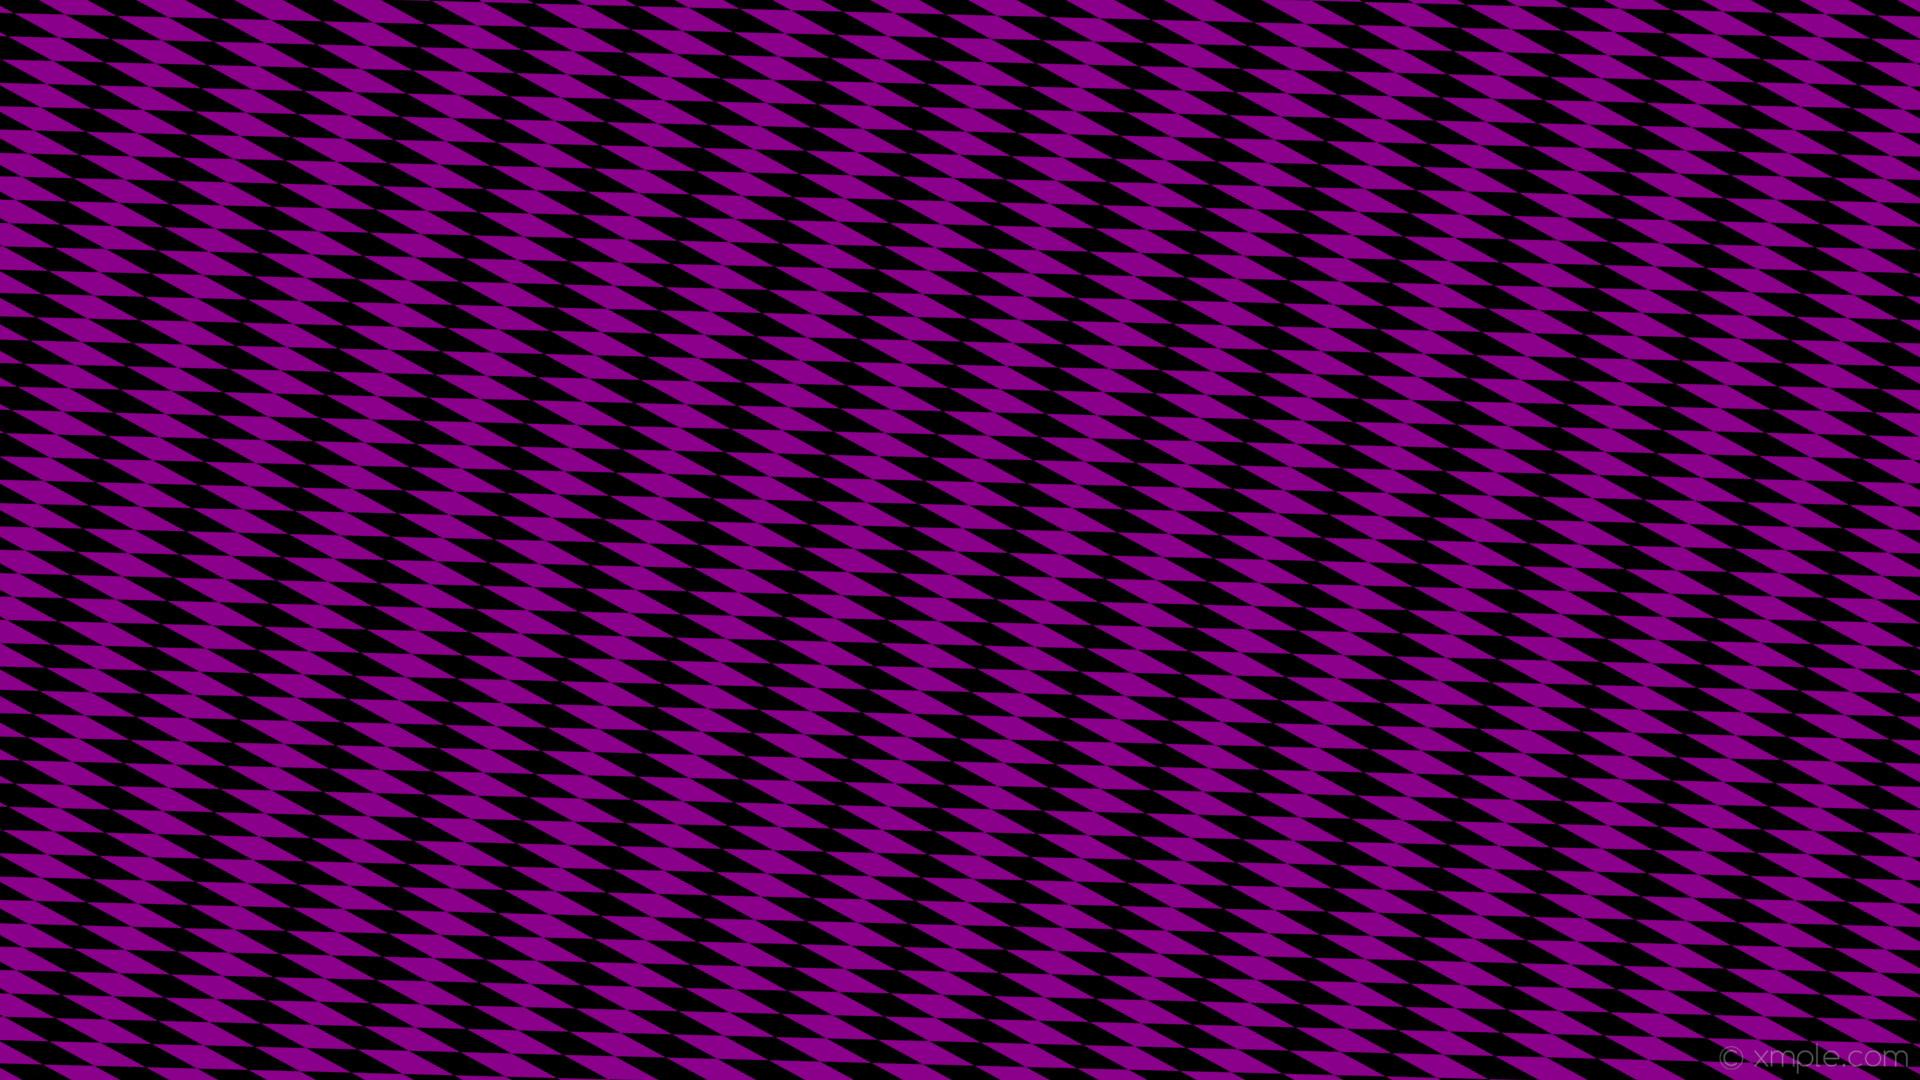 wallpaper purple diamond rhombus black lozenge dark magenta #8b008b #000000  165° 100px 24px